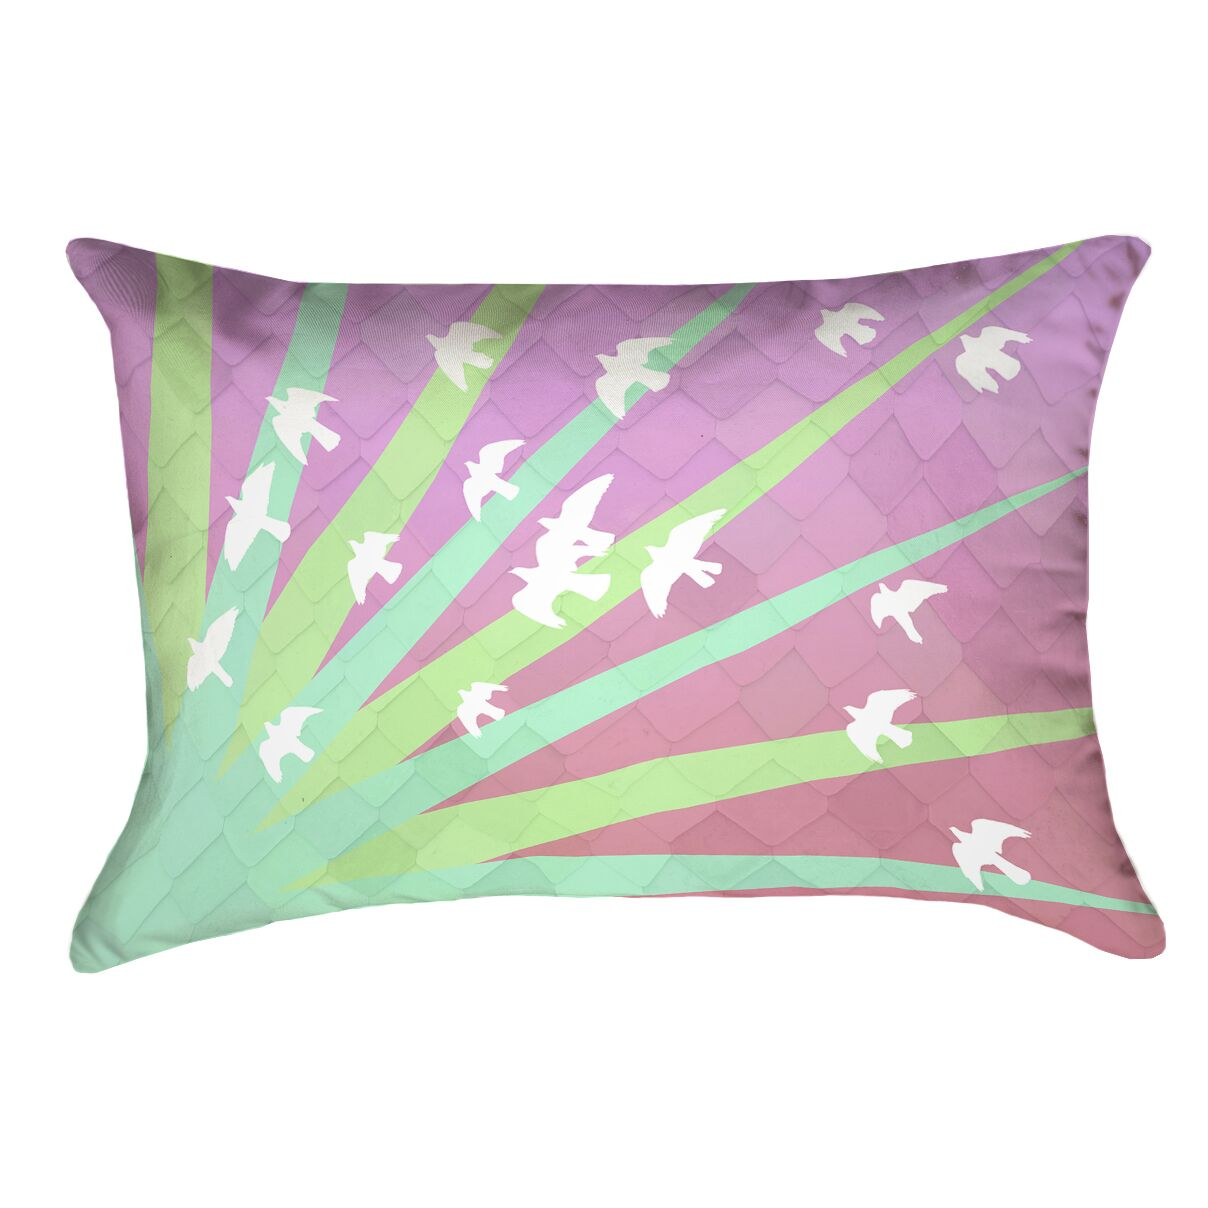 Enciso Birds and Sun Rectangular Indoor Pillow Cover Color: Green/Pink